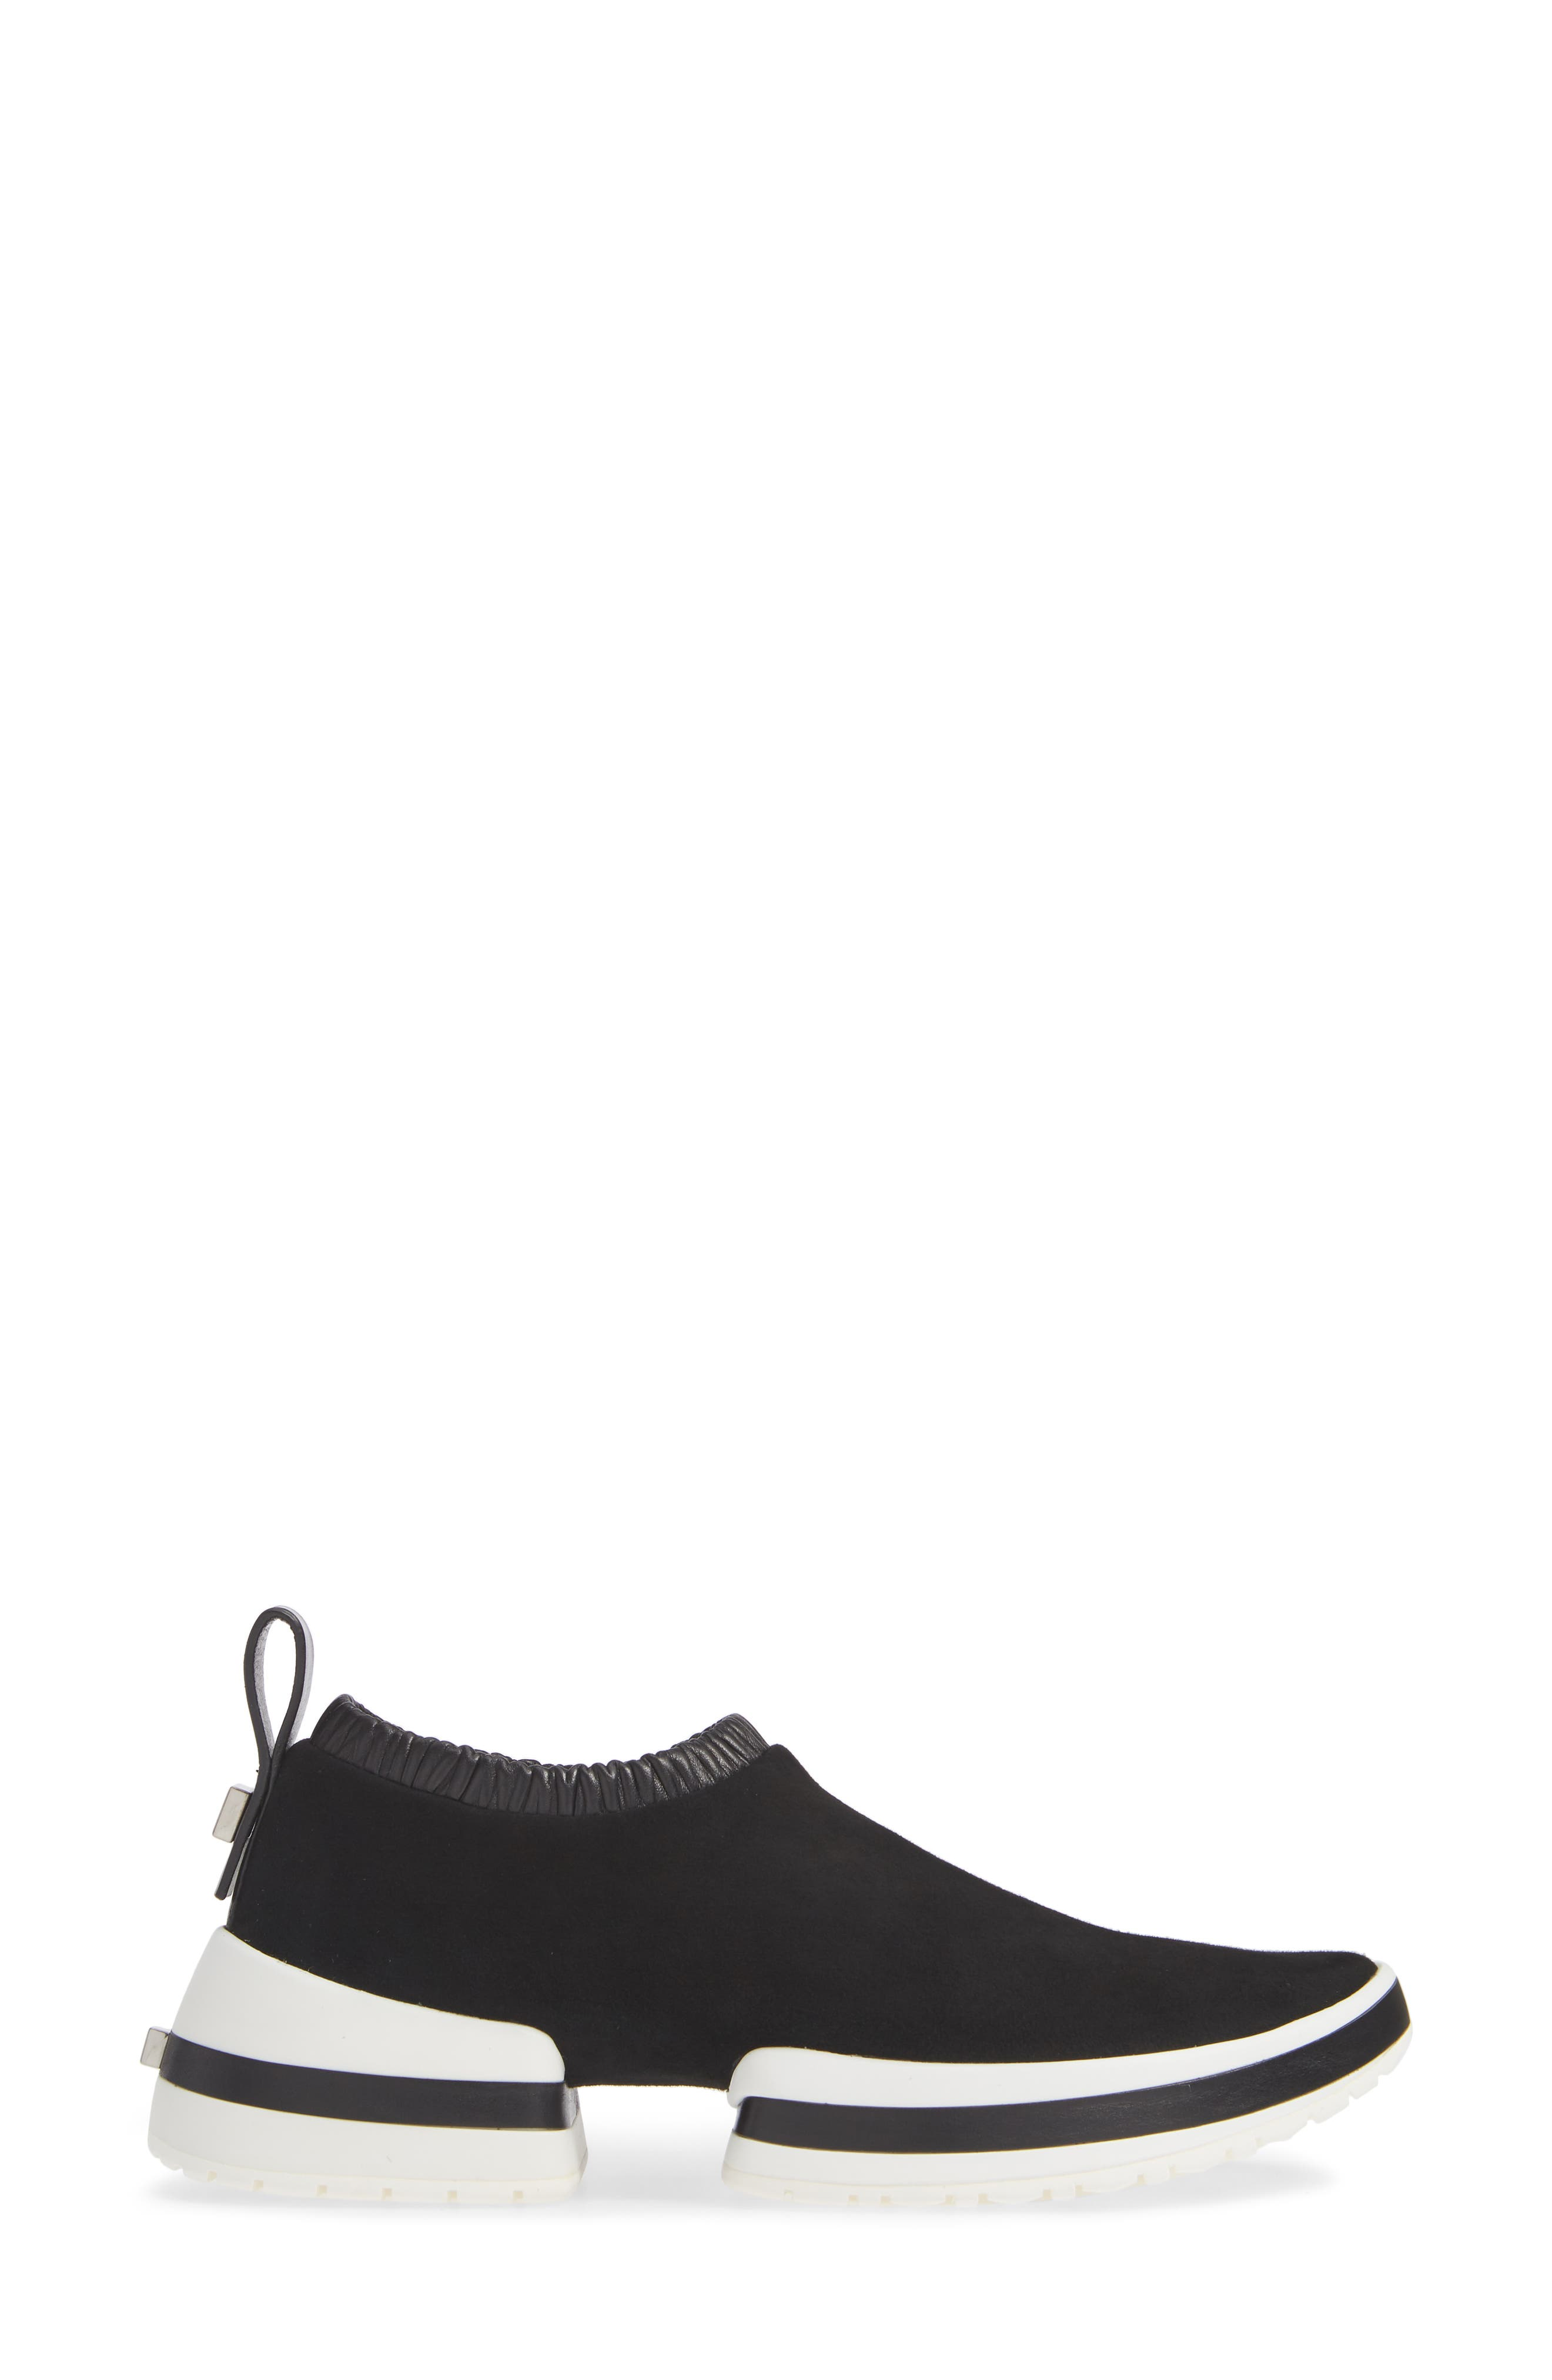 612 Sneaker,                             Alternate thumbnail 3, color,                             BLACK SUEDE